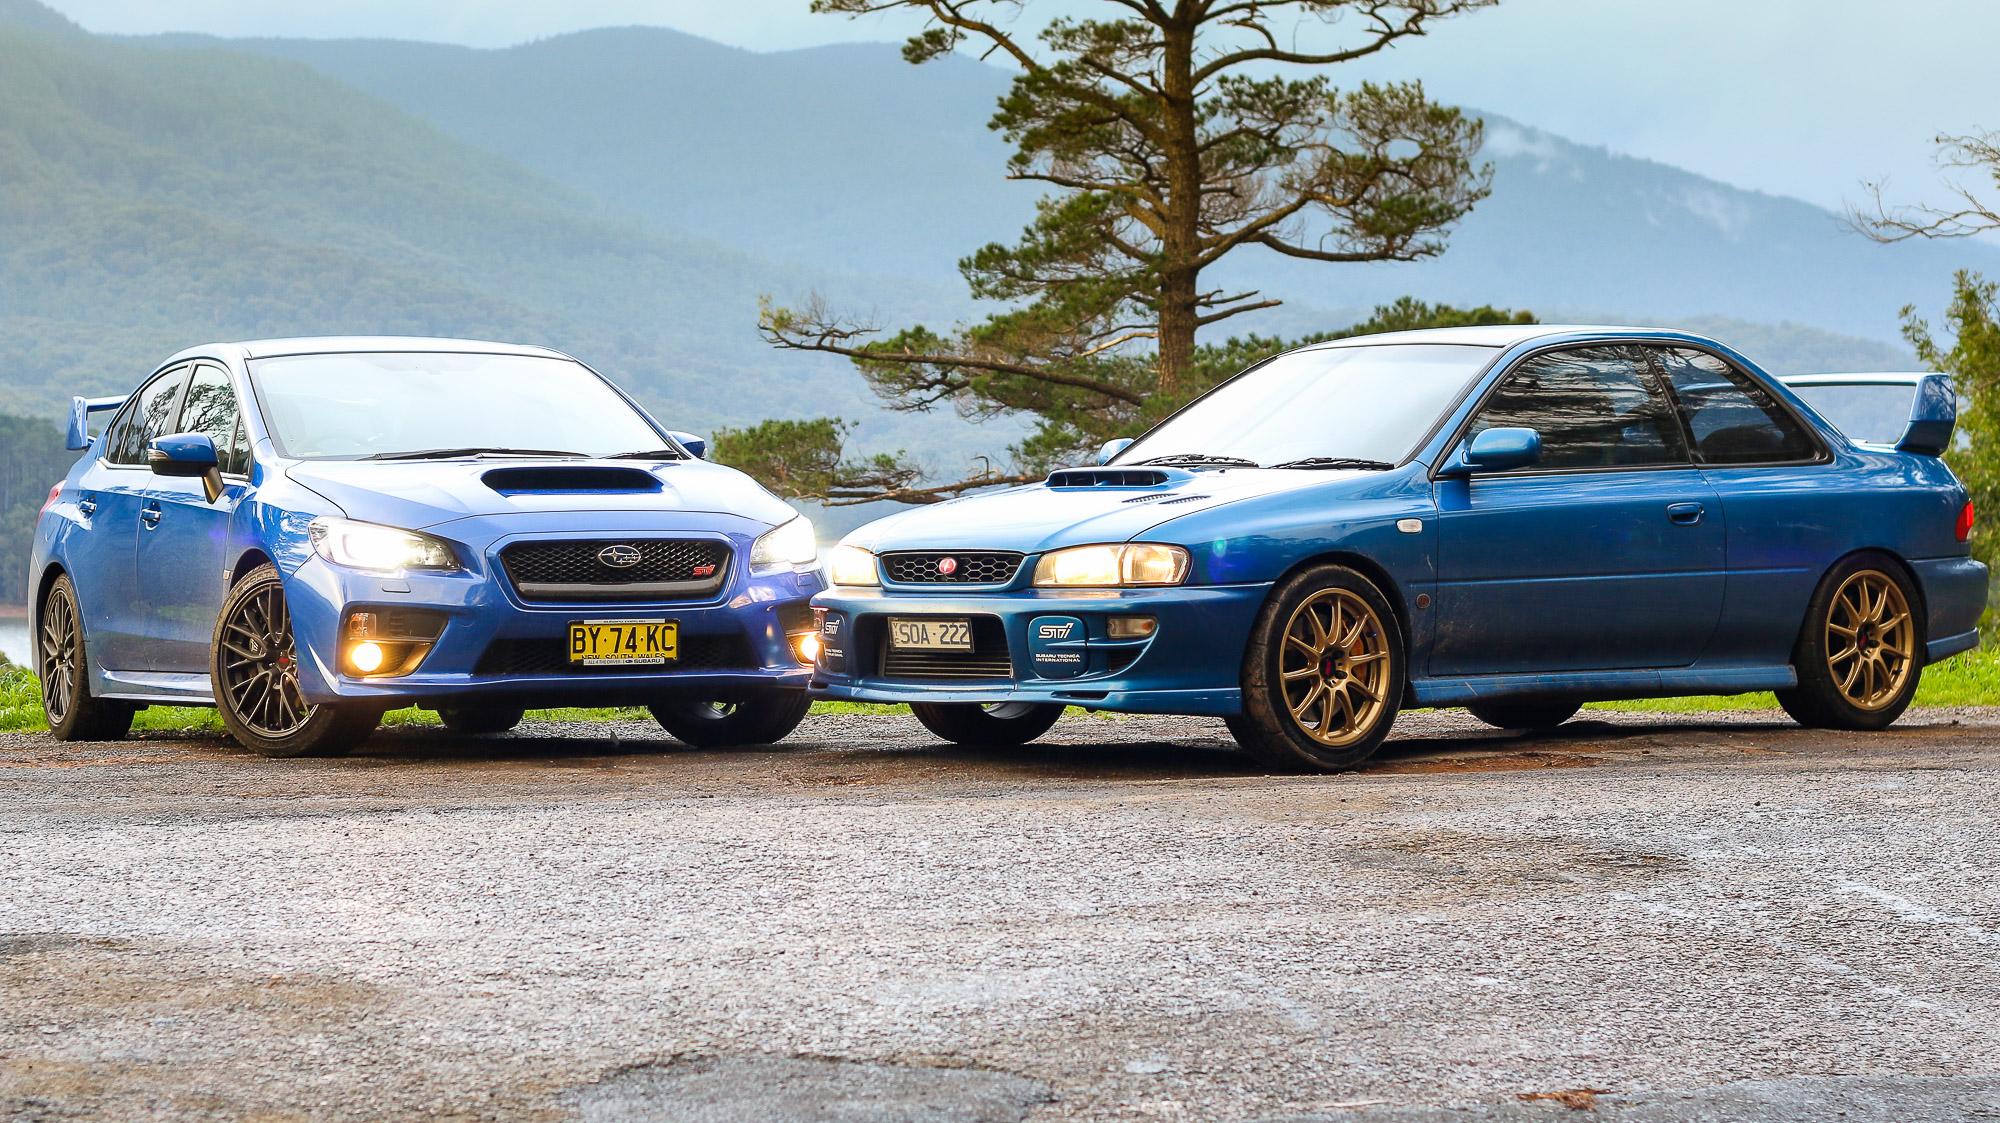 Subaru Wrx Sti Old V New Comparison 2015 Sedan V 1999 Two